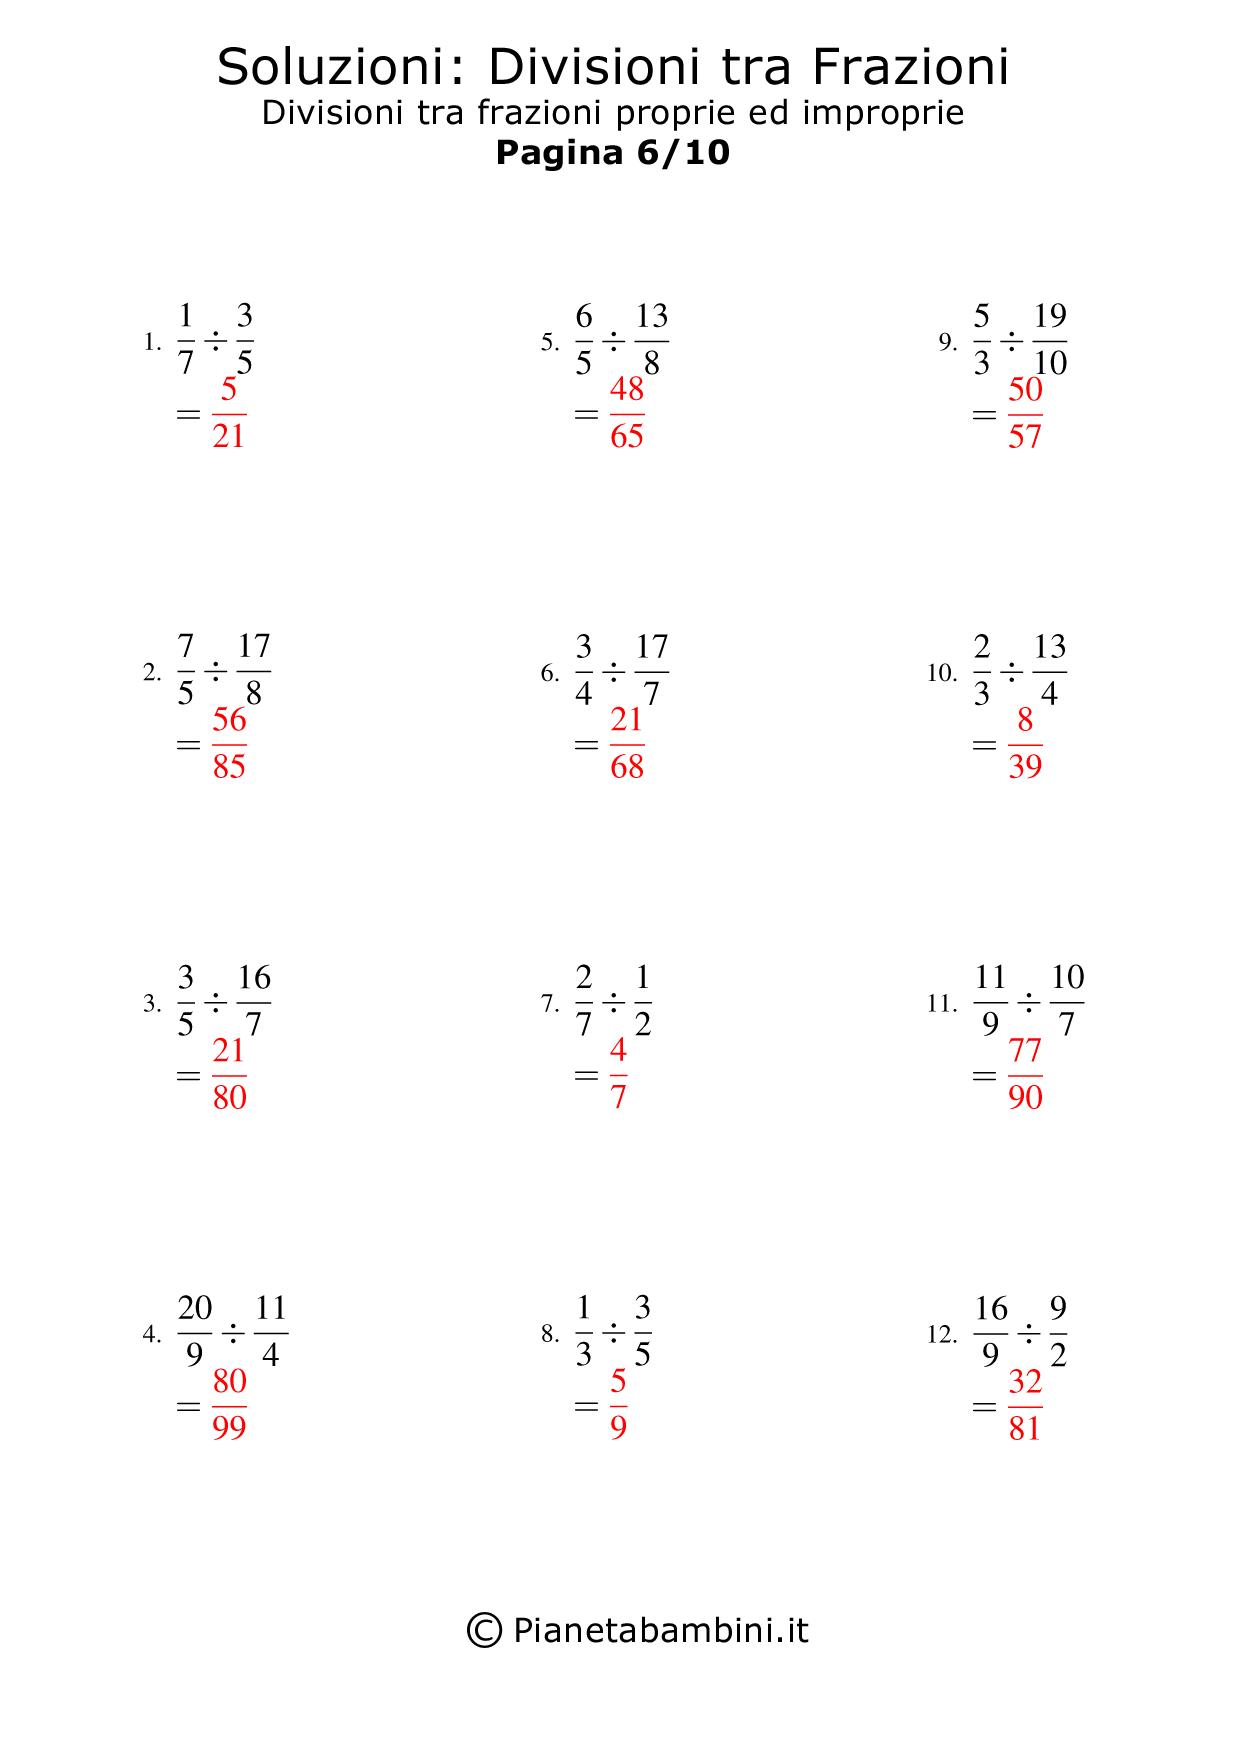 Soluzioni-Divisioni-Frazioni-Proprie-Improprie_06